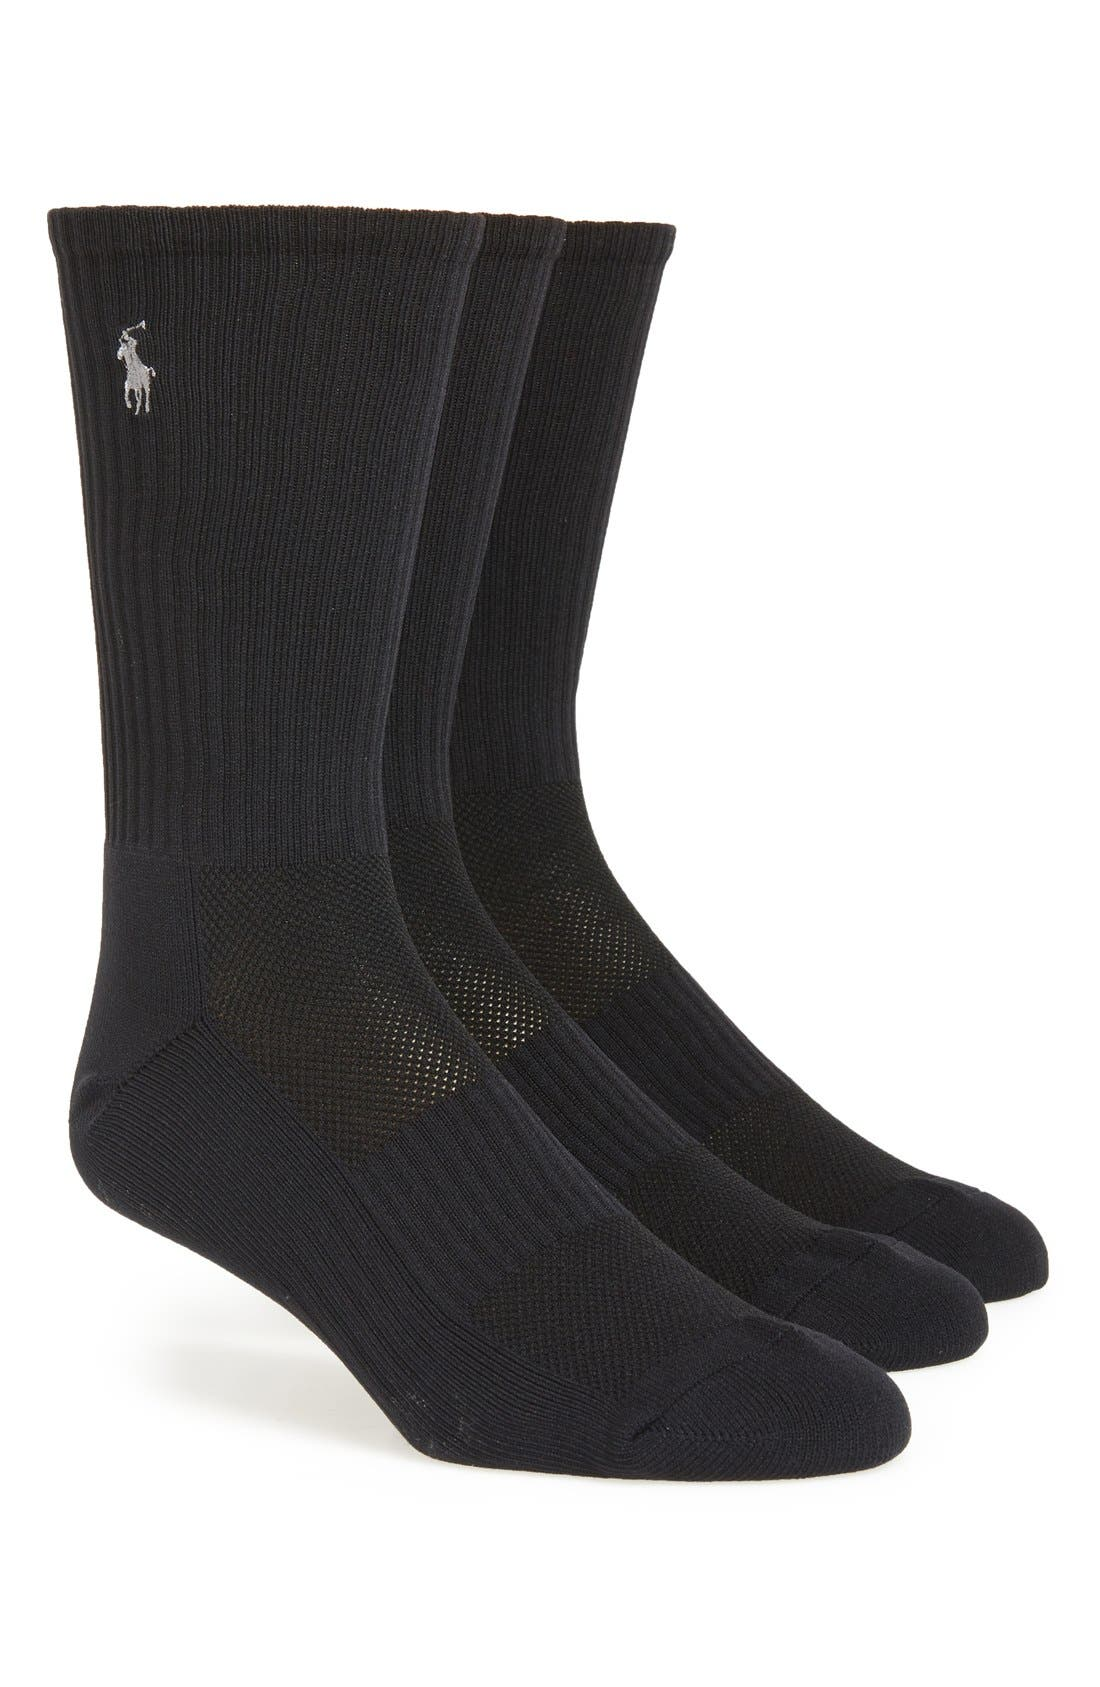 Tech Athletic Crew Socks,                             Main thumbnail 1, color,                             BLACK